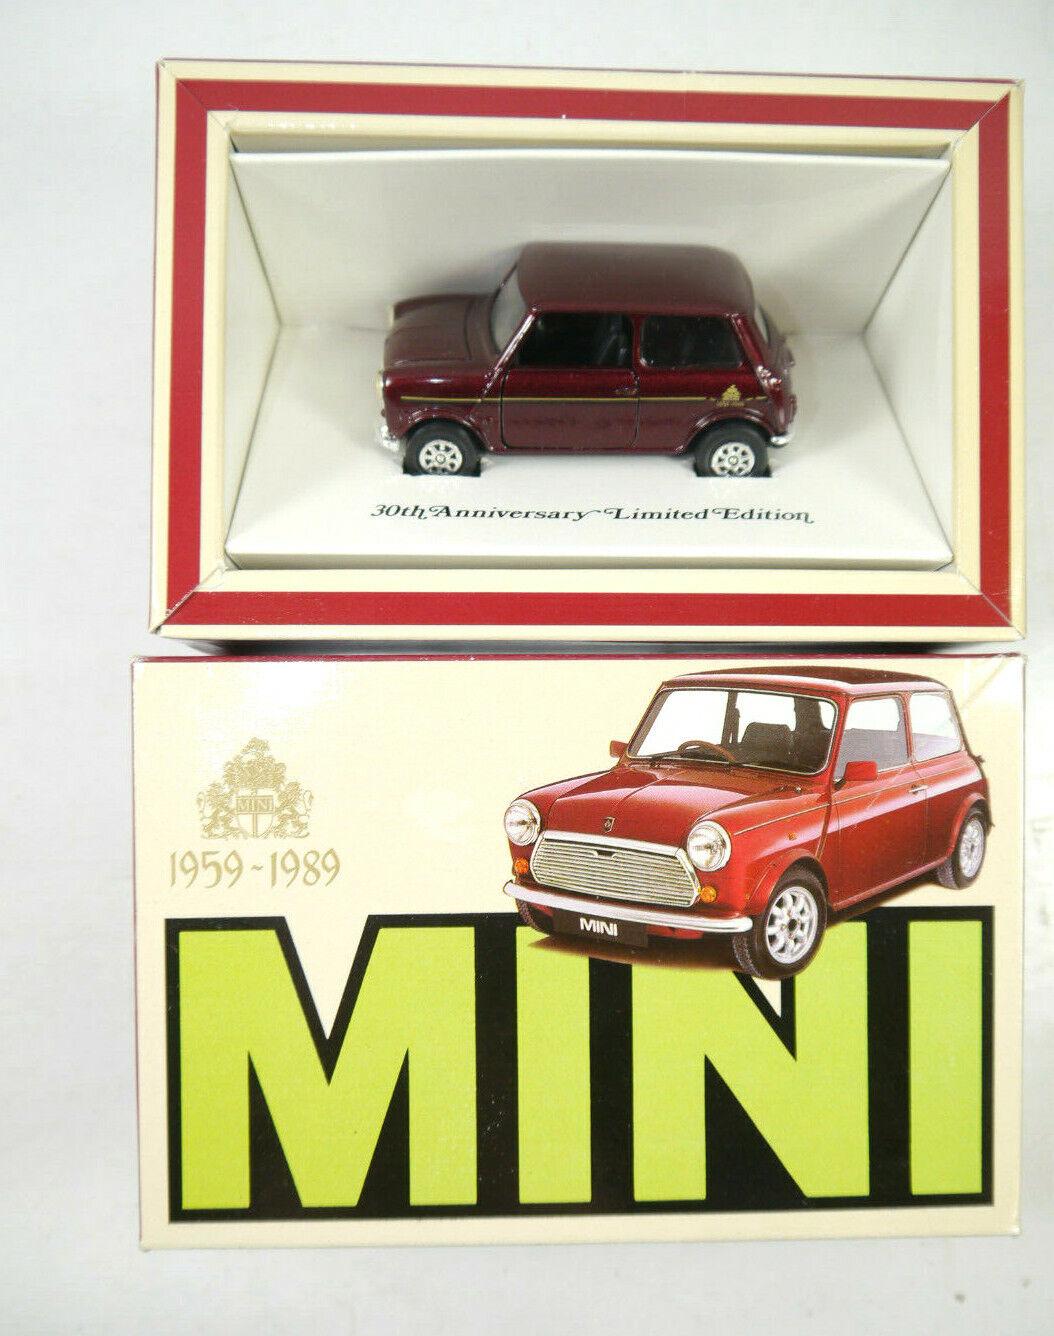 CORGI 60022 Mini Cooper 1959-1989 Metall Metall Metall Modellauto rover Limitiert 1 43 (K62) db3d6c